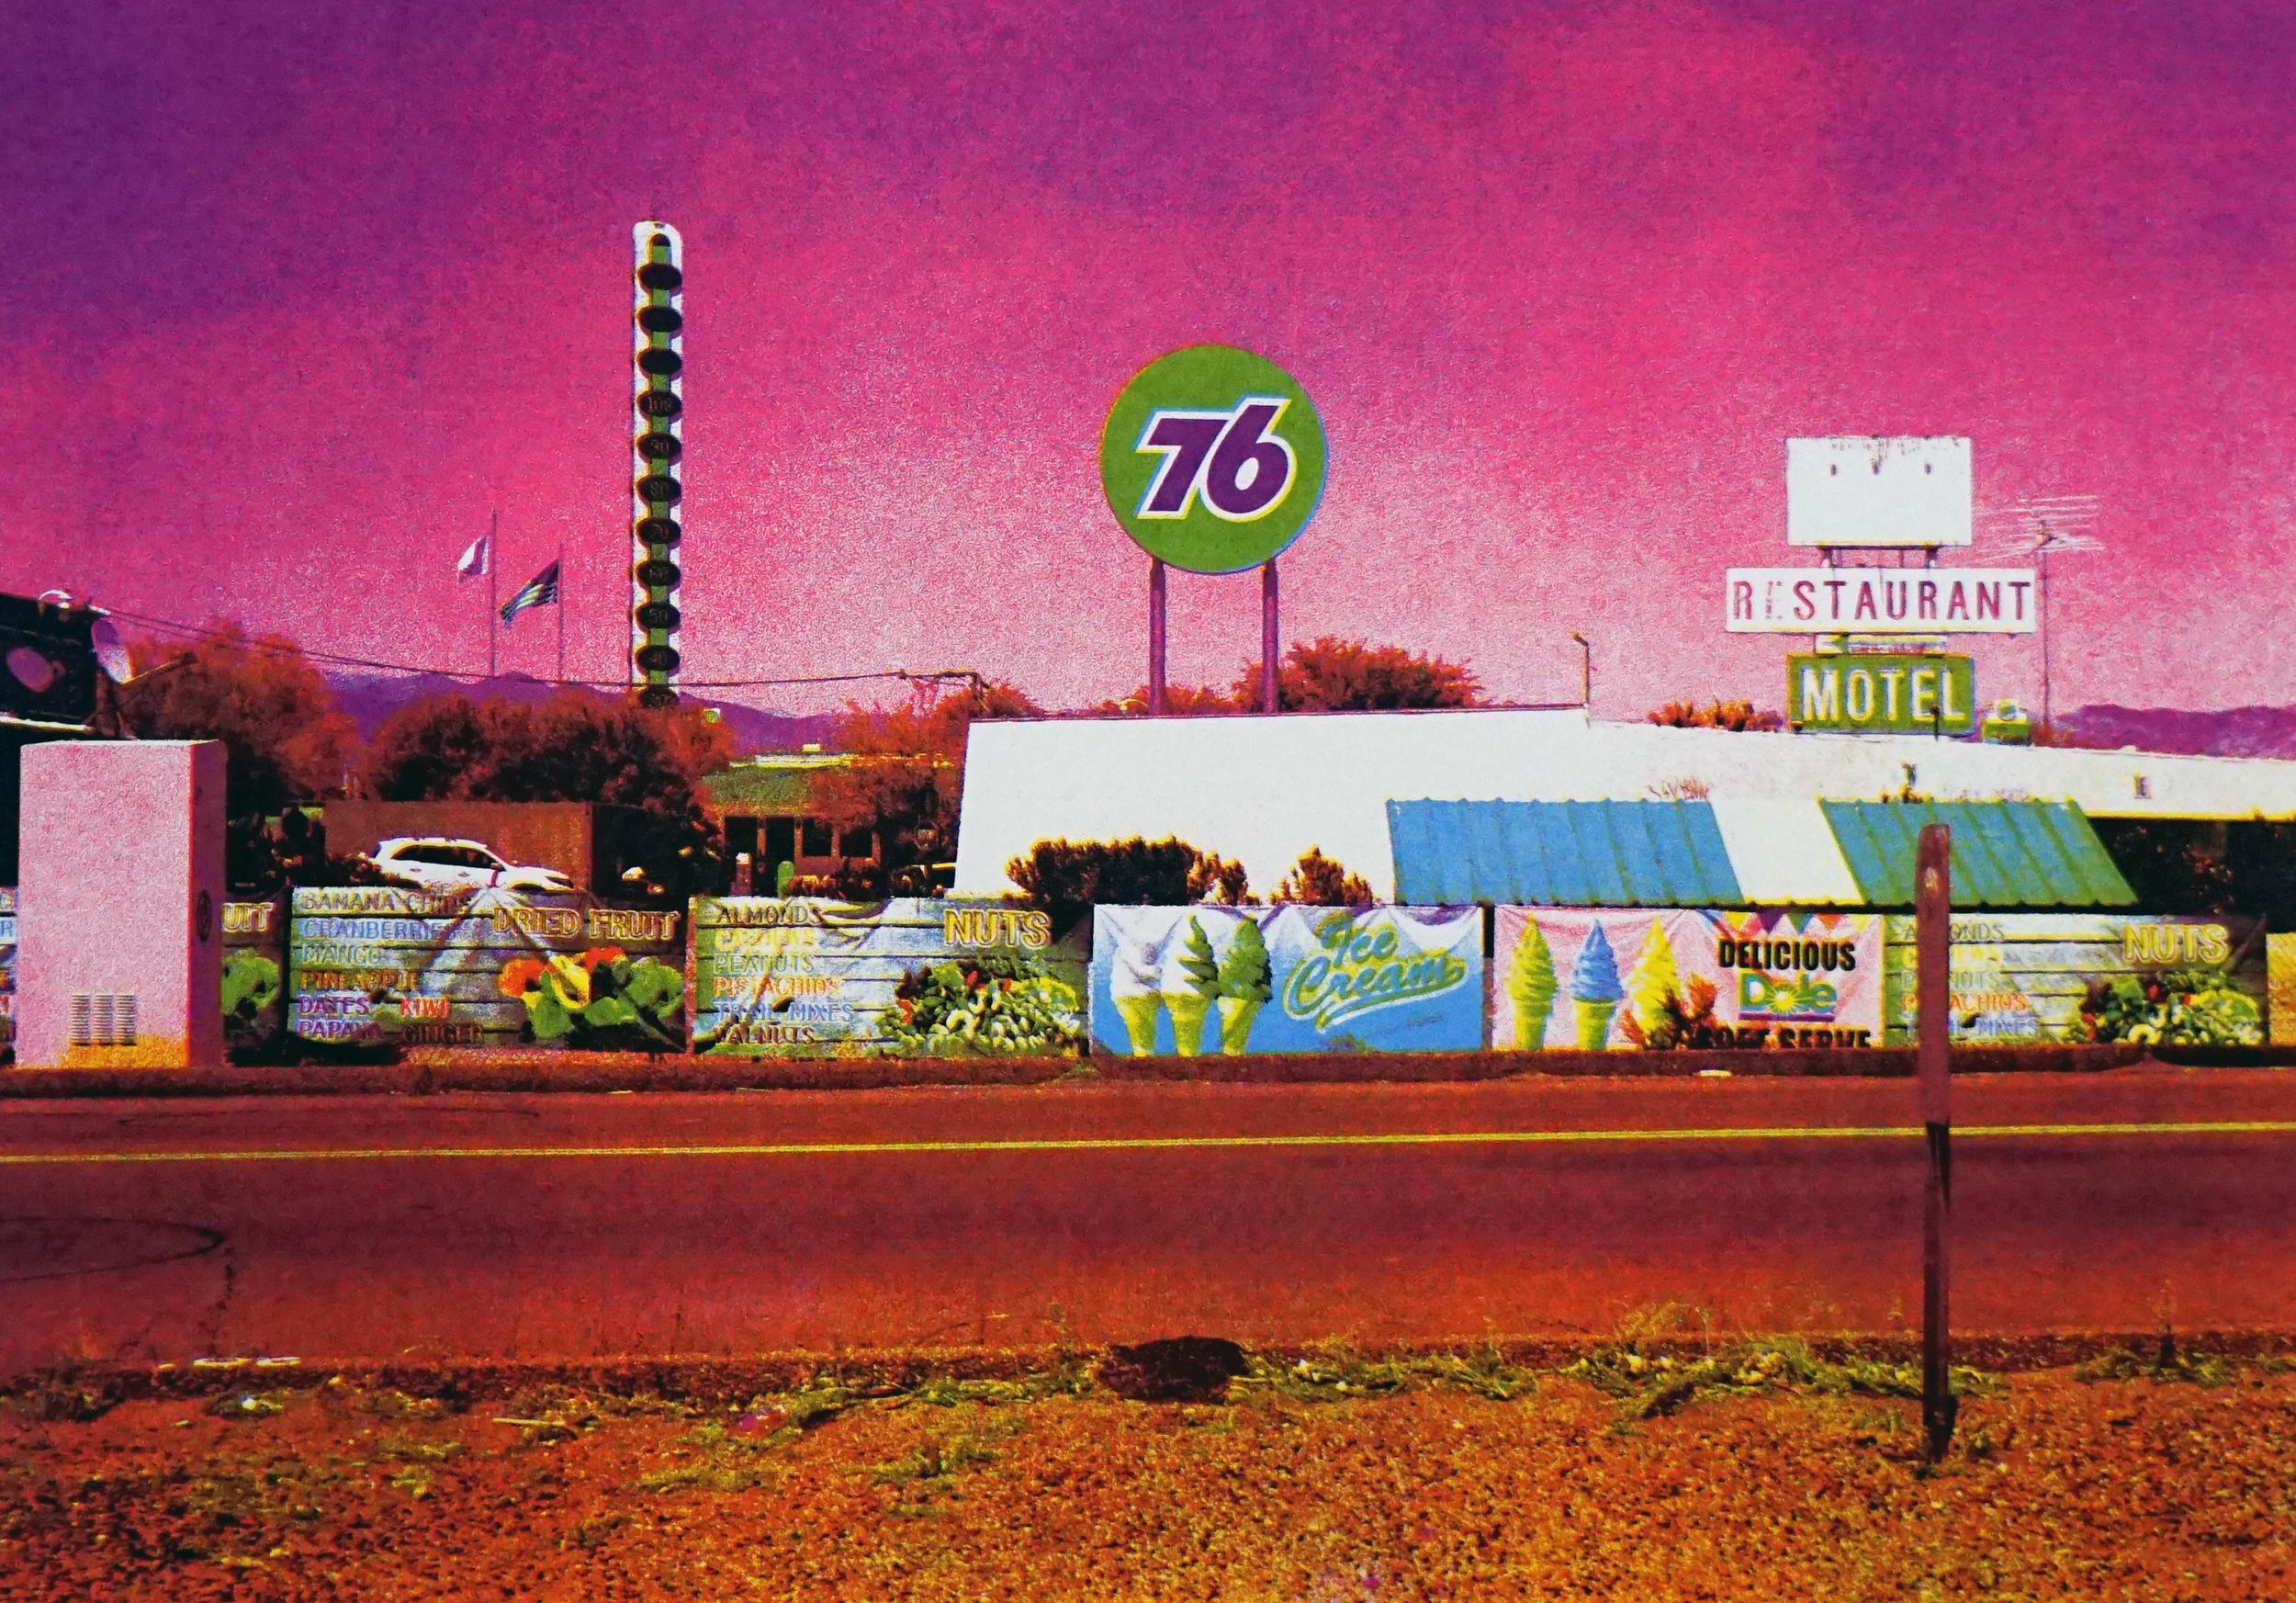 """76 In Las Vegas""     Screenprint  44 x 30.5"